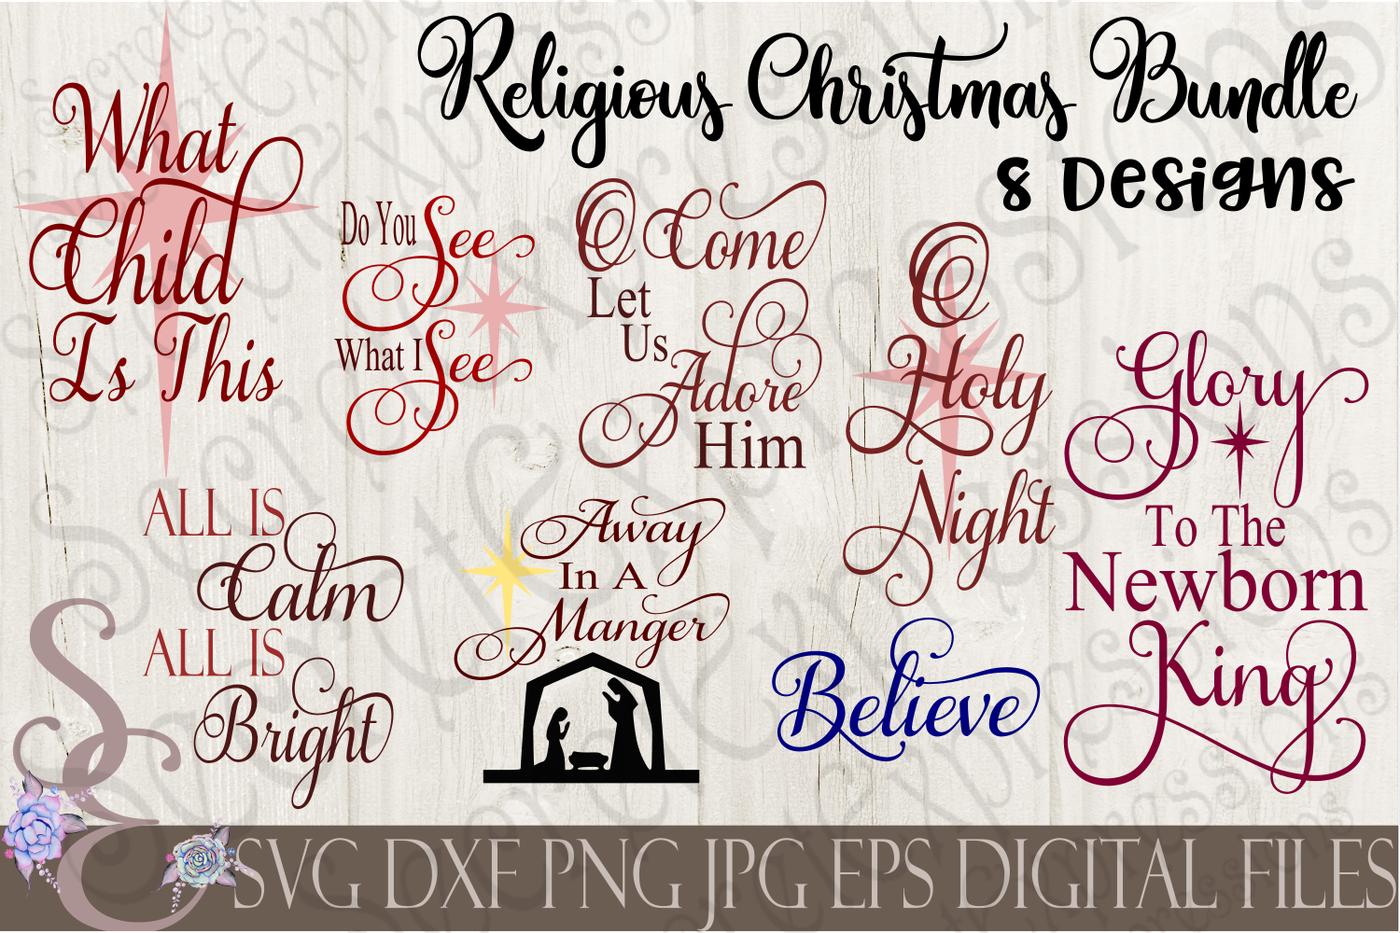 Religious Christmas Svg Bundle 8 Designs By Secretexpressionssvg